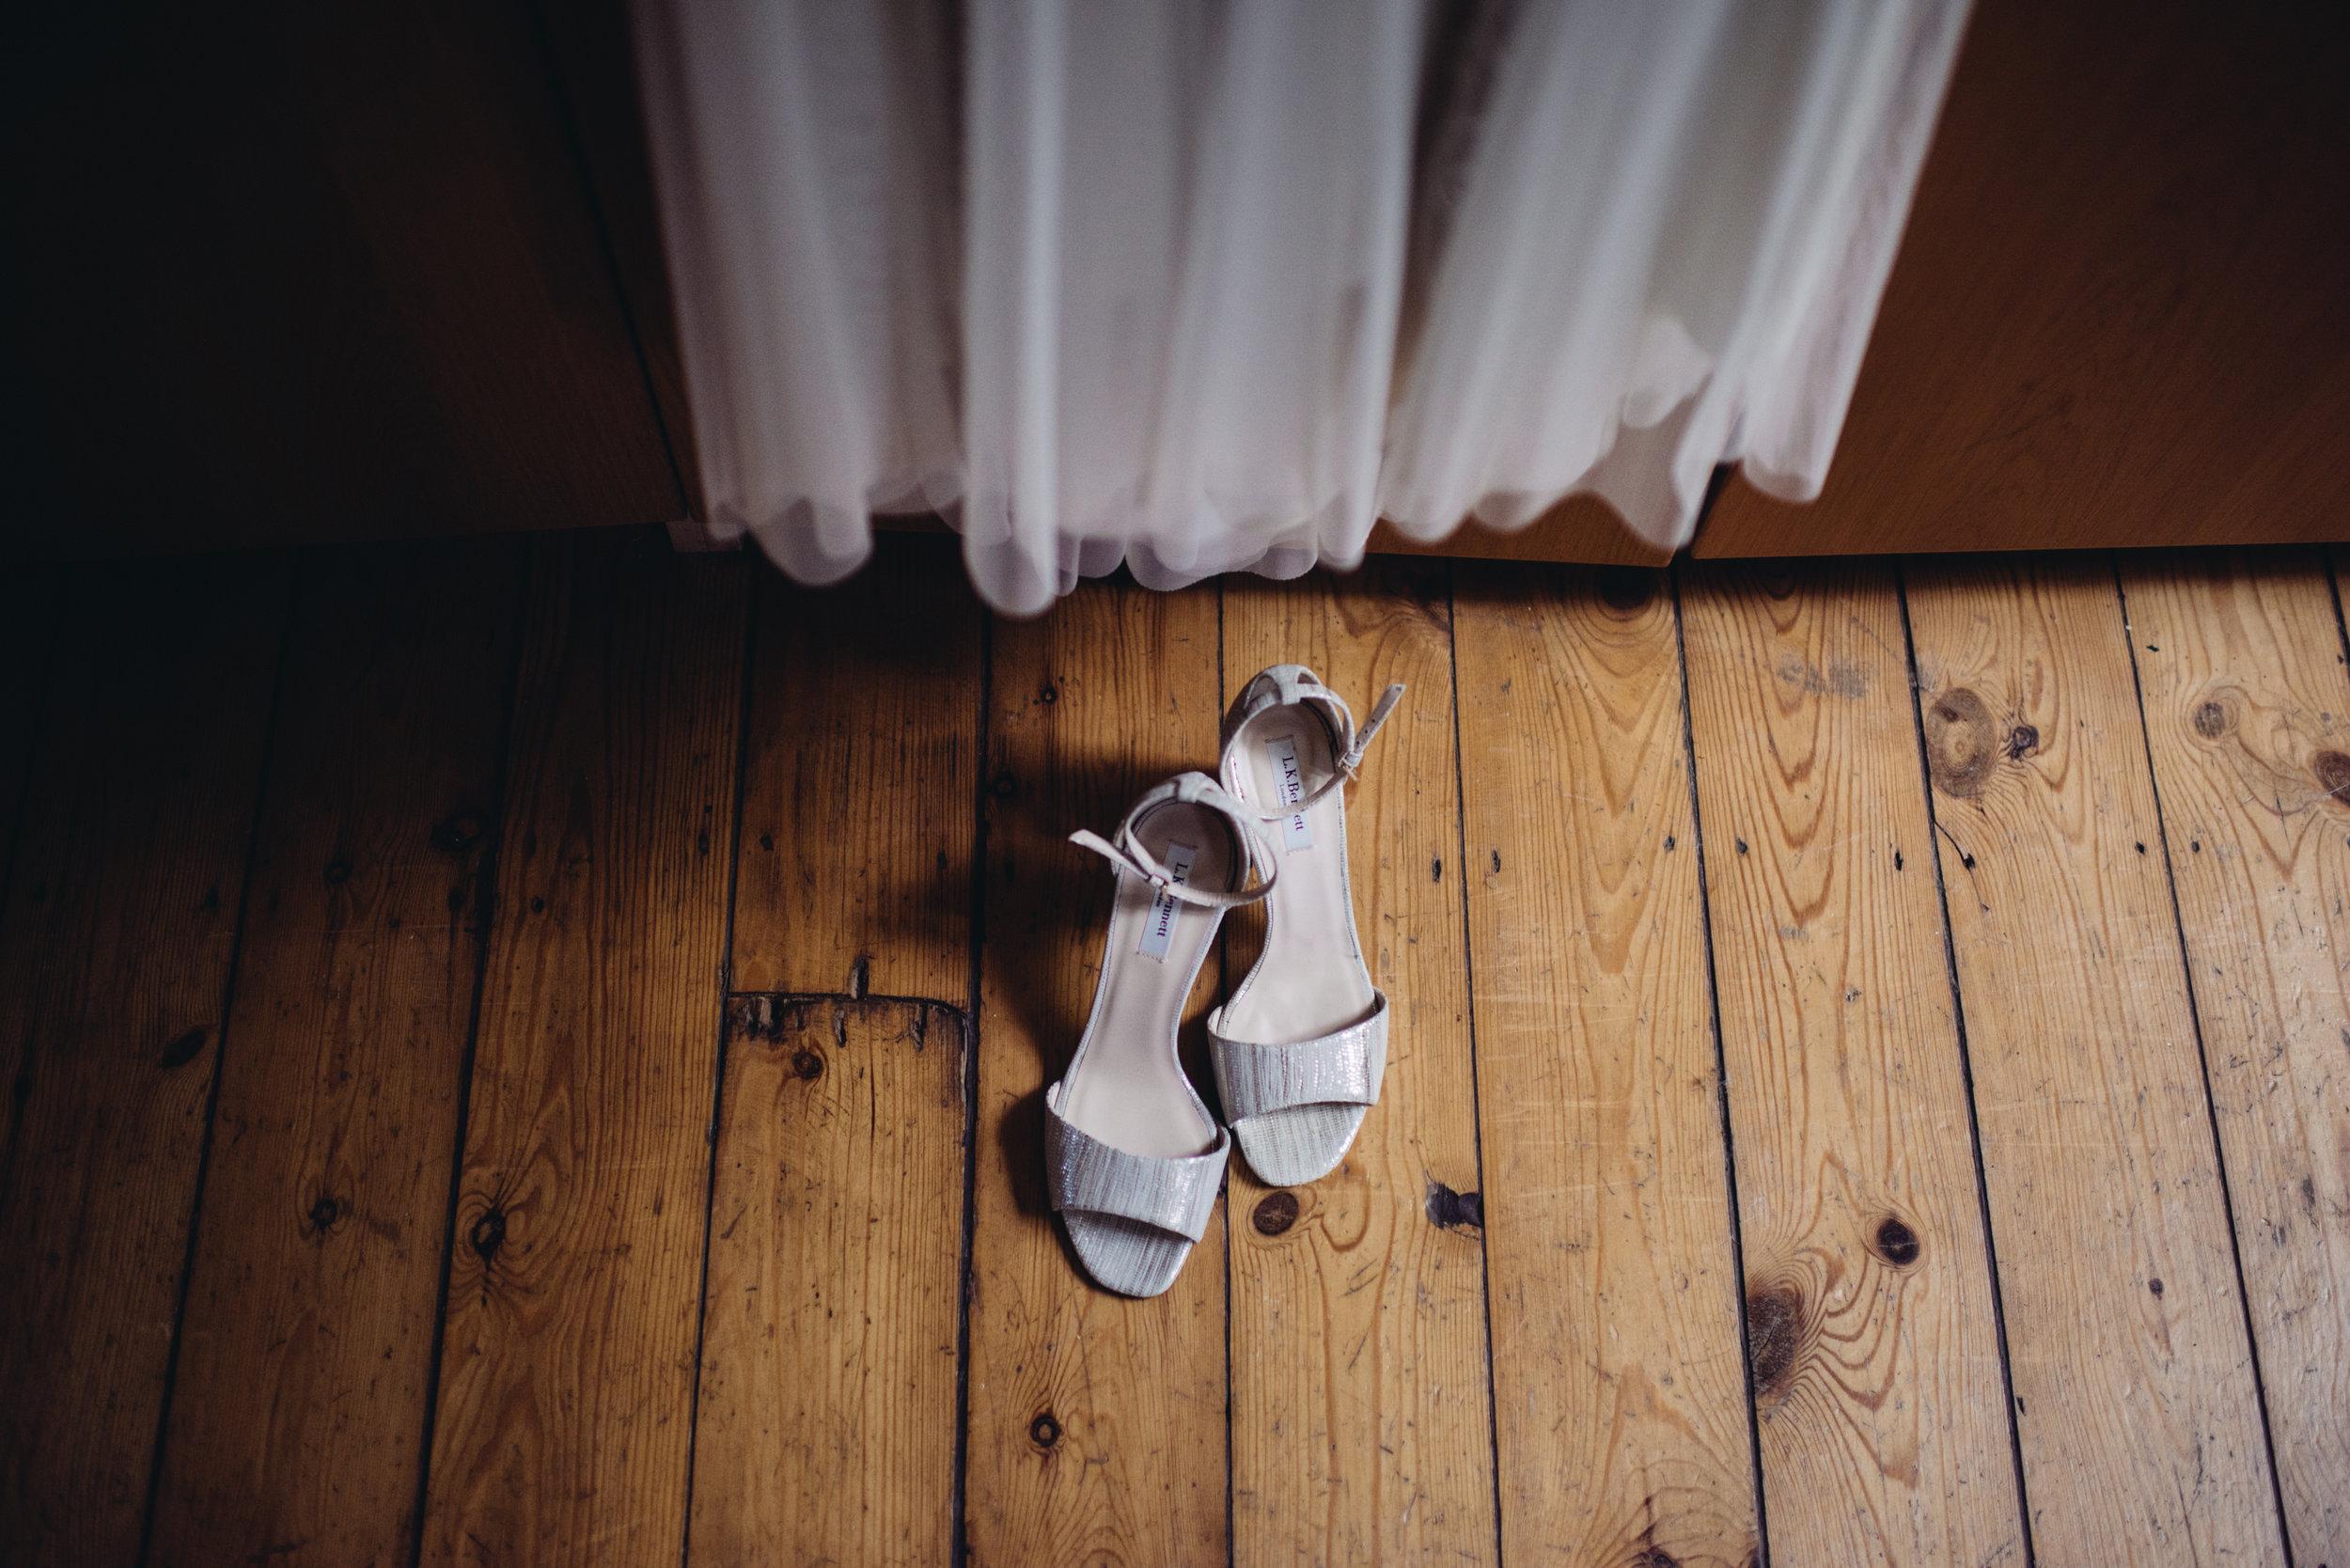 0245-LISA-DEVINE-PHOTOGRAPHY-ALTERNATIVE-WEDDING-PHOTOGRAPHY-SCOTLAND-DESTINATION-WEDDINGS-GLASGOW-WEDDINGS-COOL-WEDDINGS-STYLISH-WEDDINGS.JPG